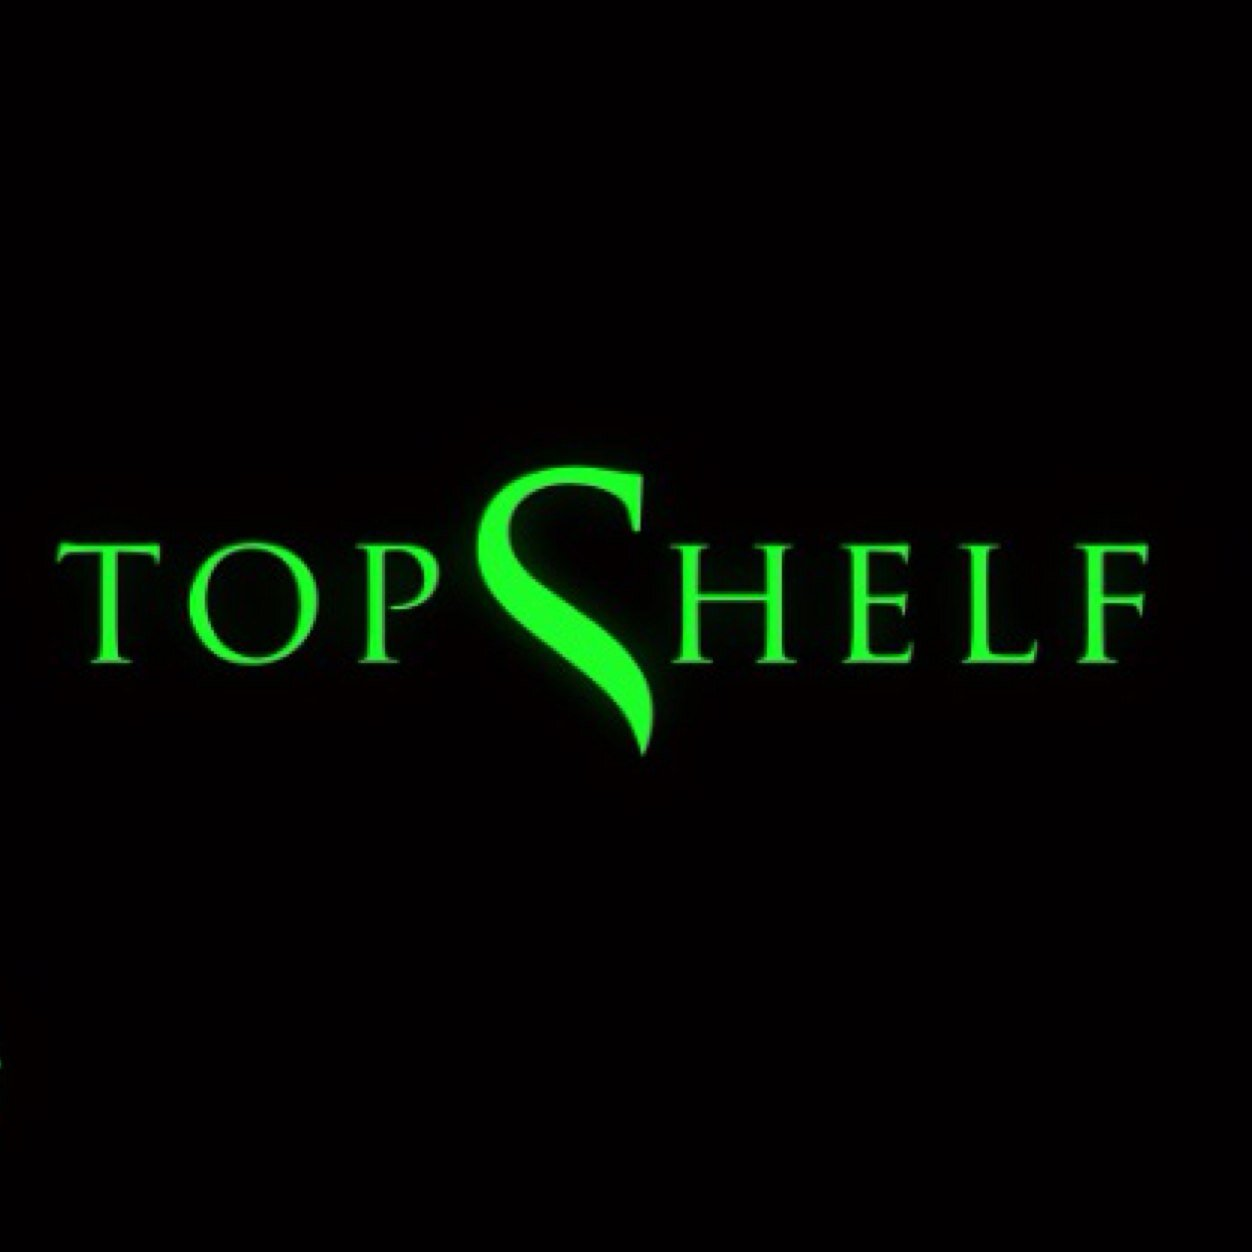 top shelf height